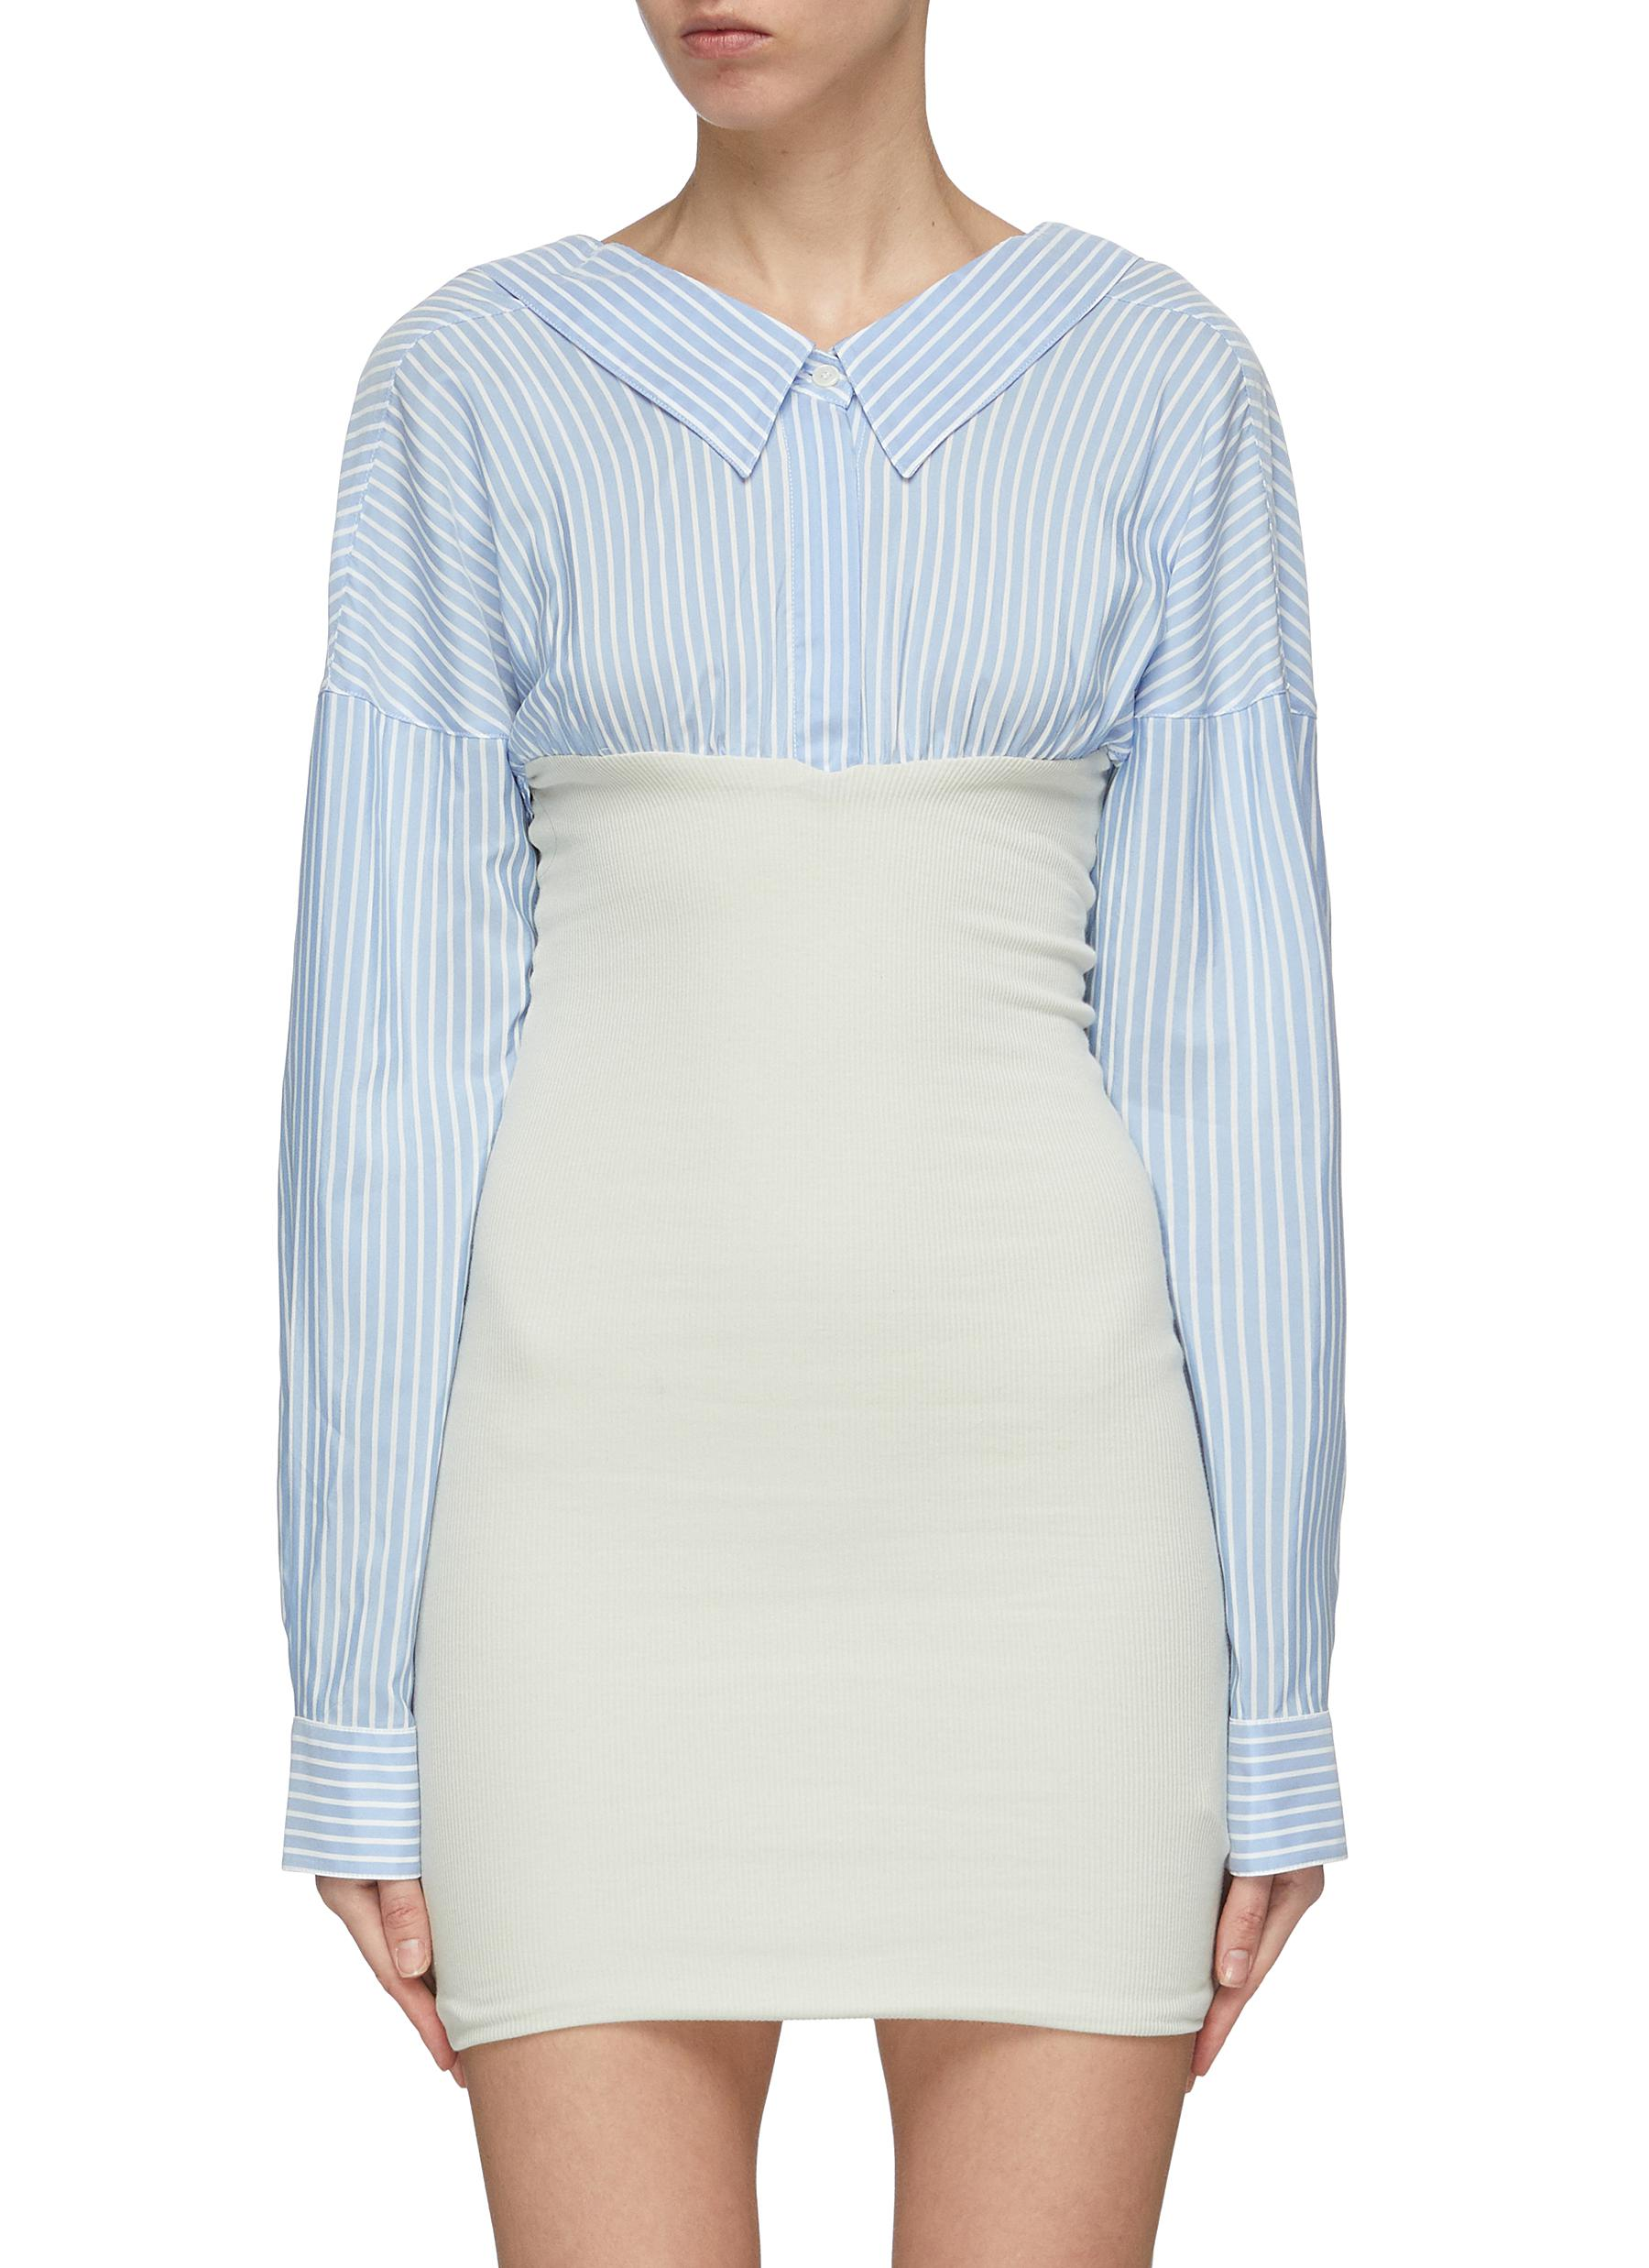 Convertible rib knit panel stripe shirt dress by Ben Taverniti Unravel Project